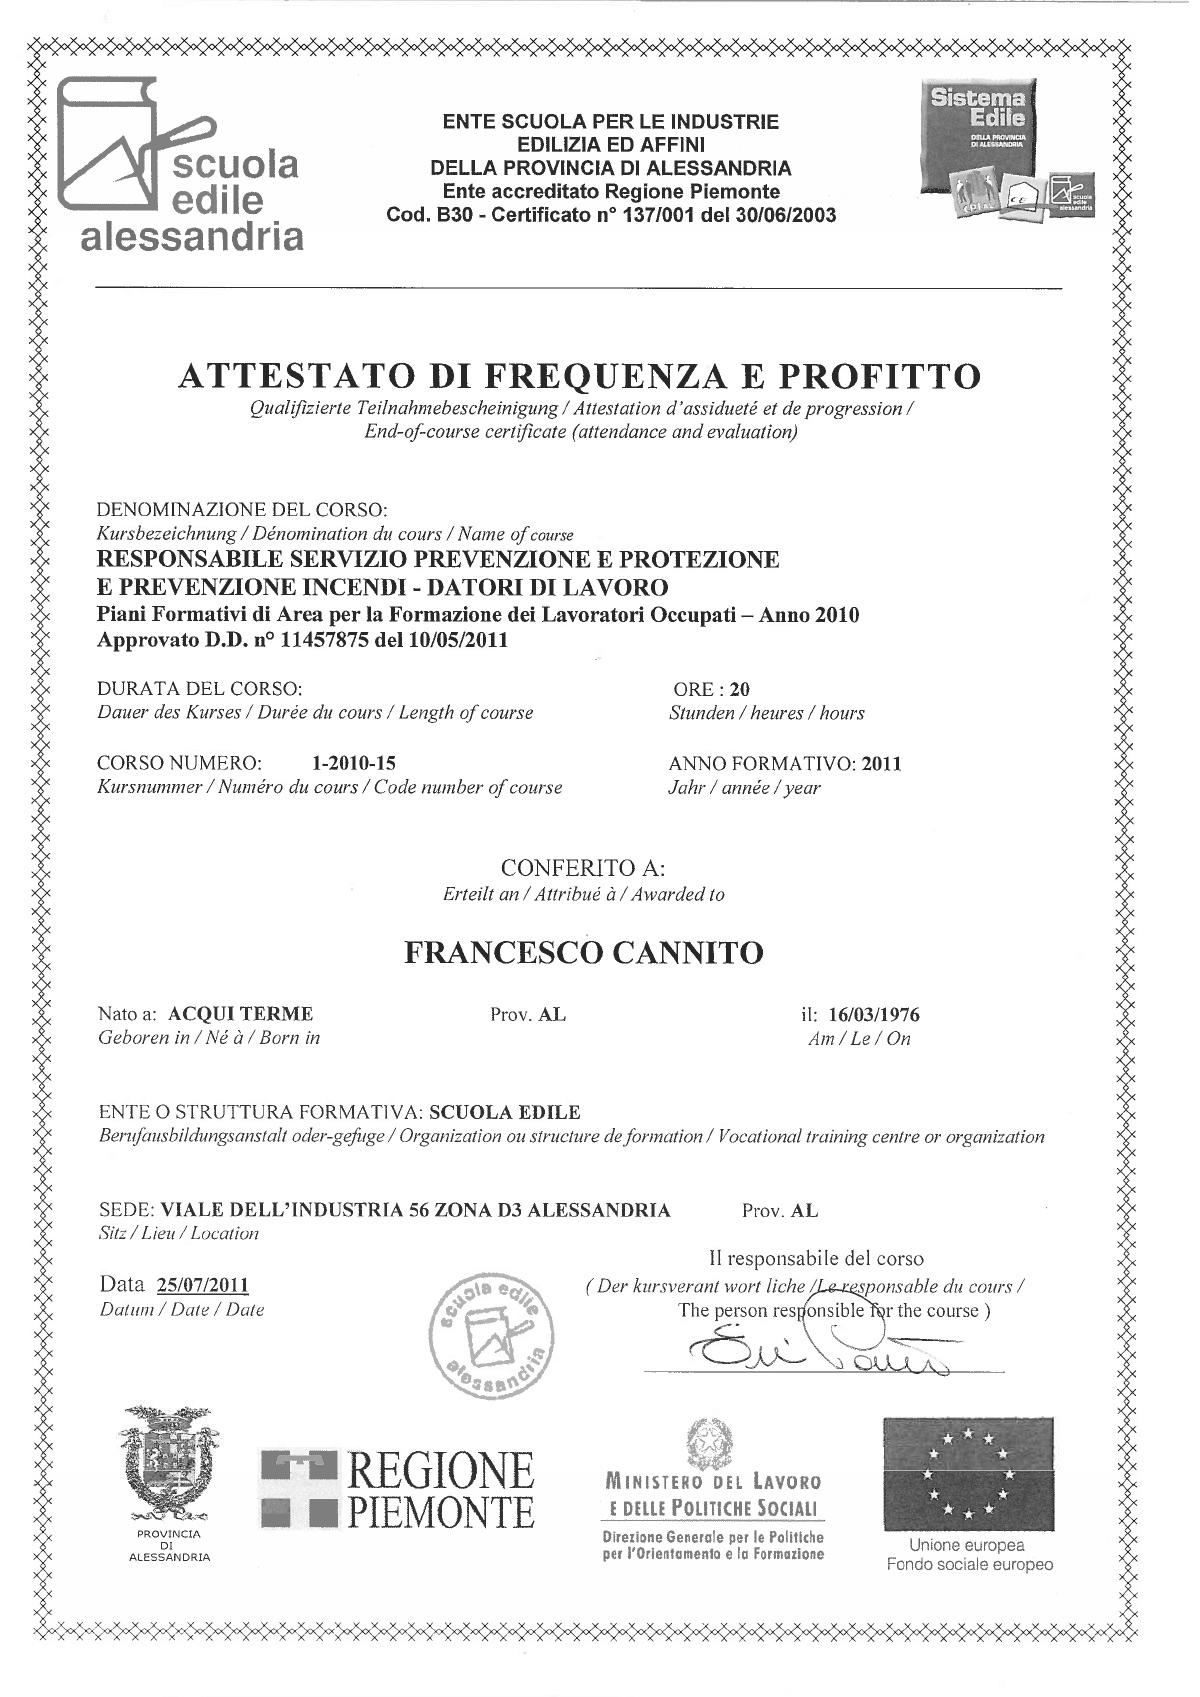 Attestato RSPP 2012